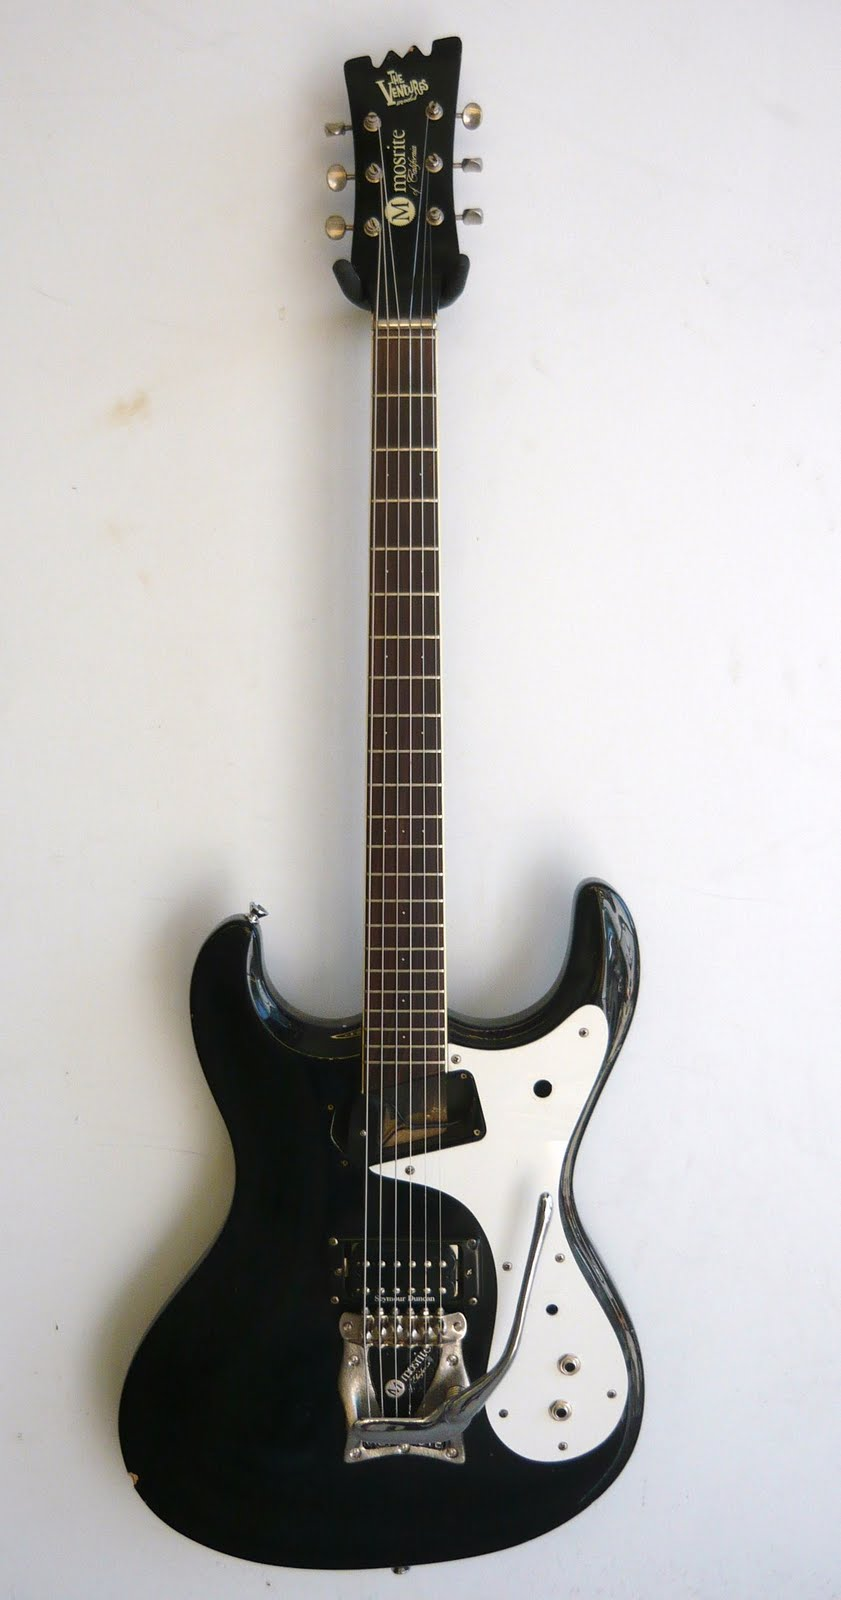 Mosrite Guitar Serial Number Decoder - kleveruae